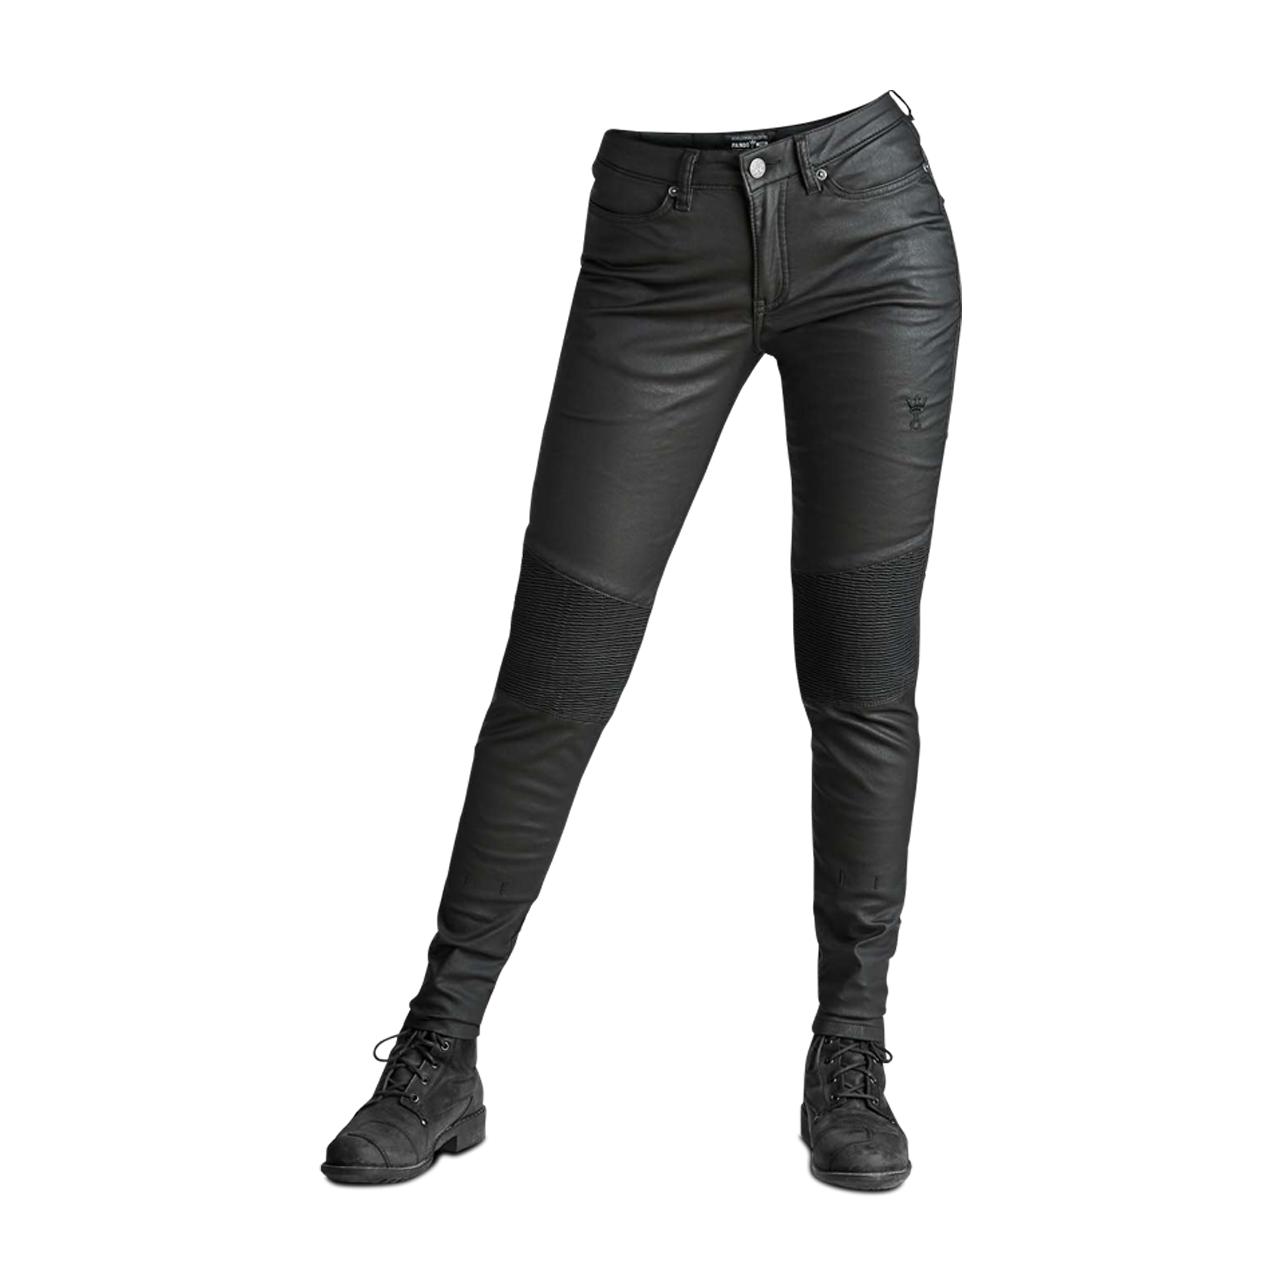 Pando Moto Jean Moto Femme Pando Moto Kusari Kev 02 Noir